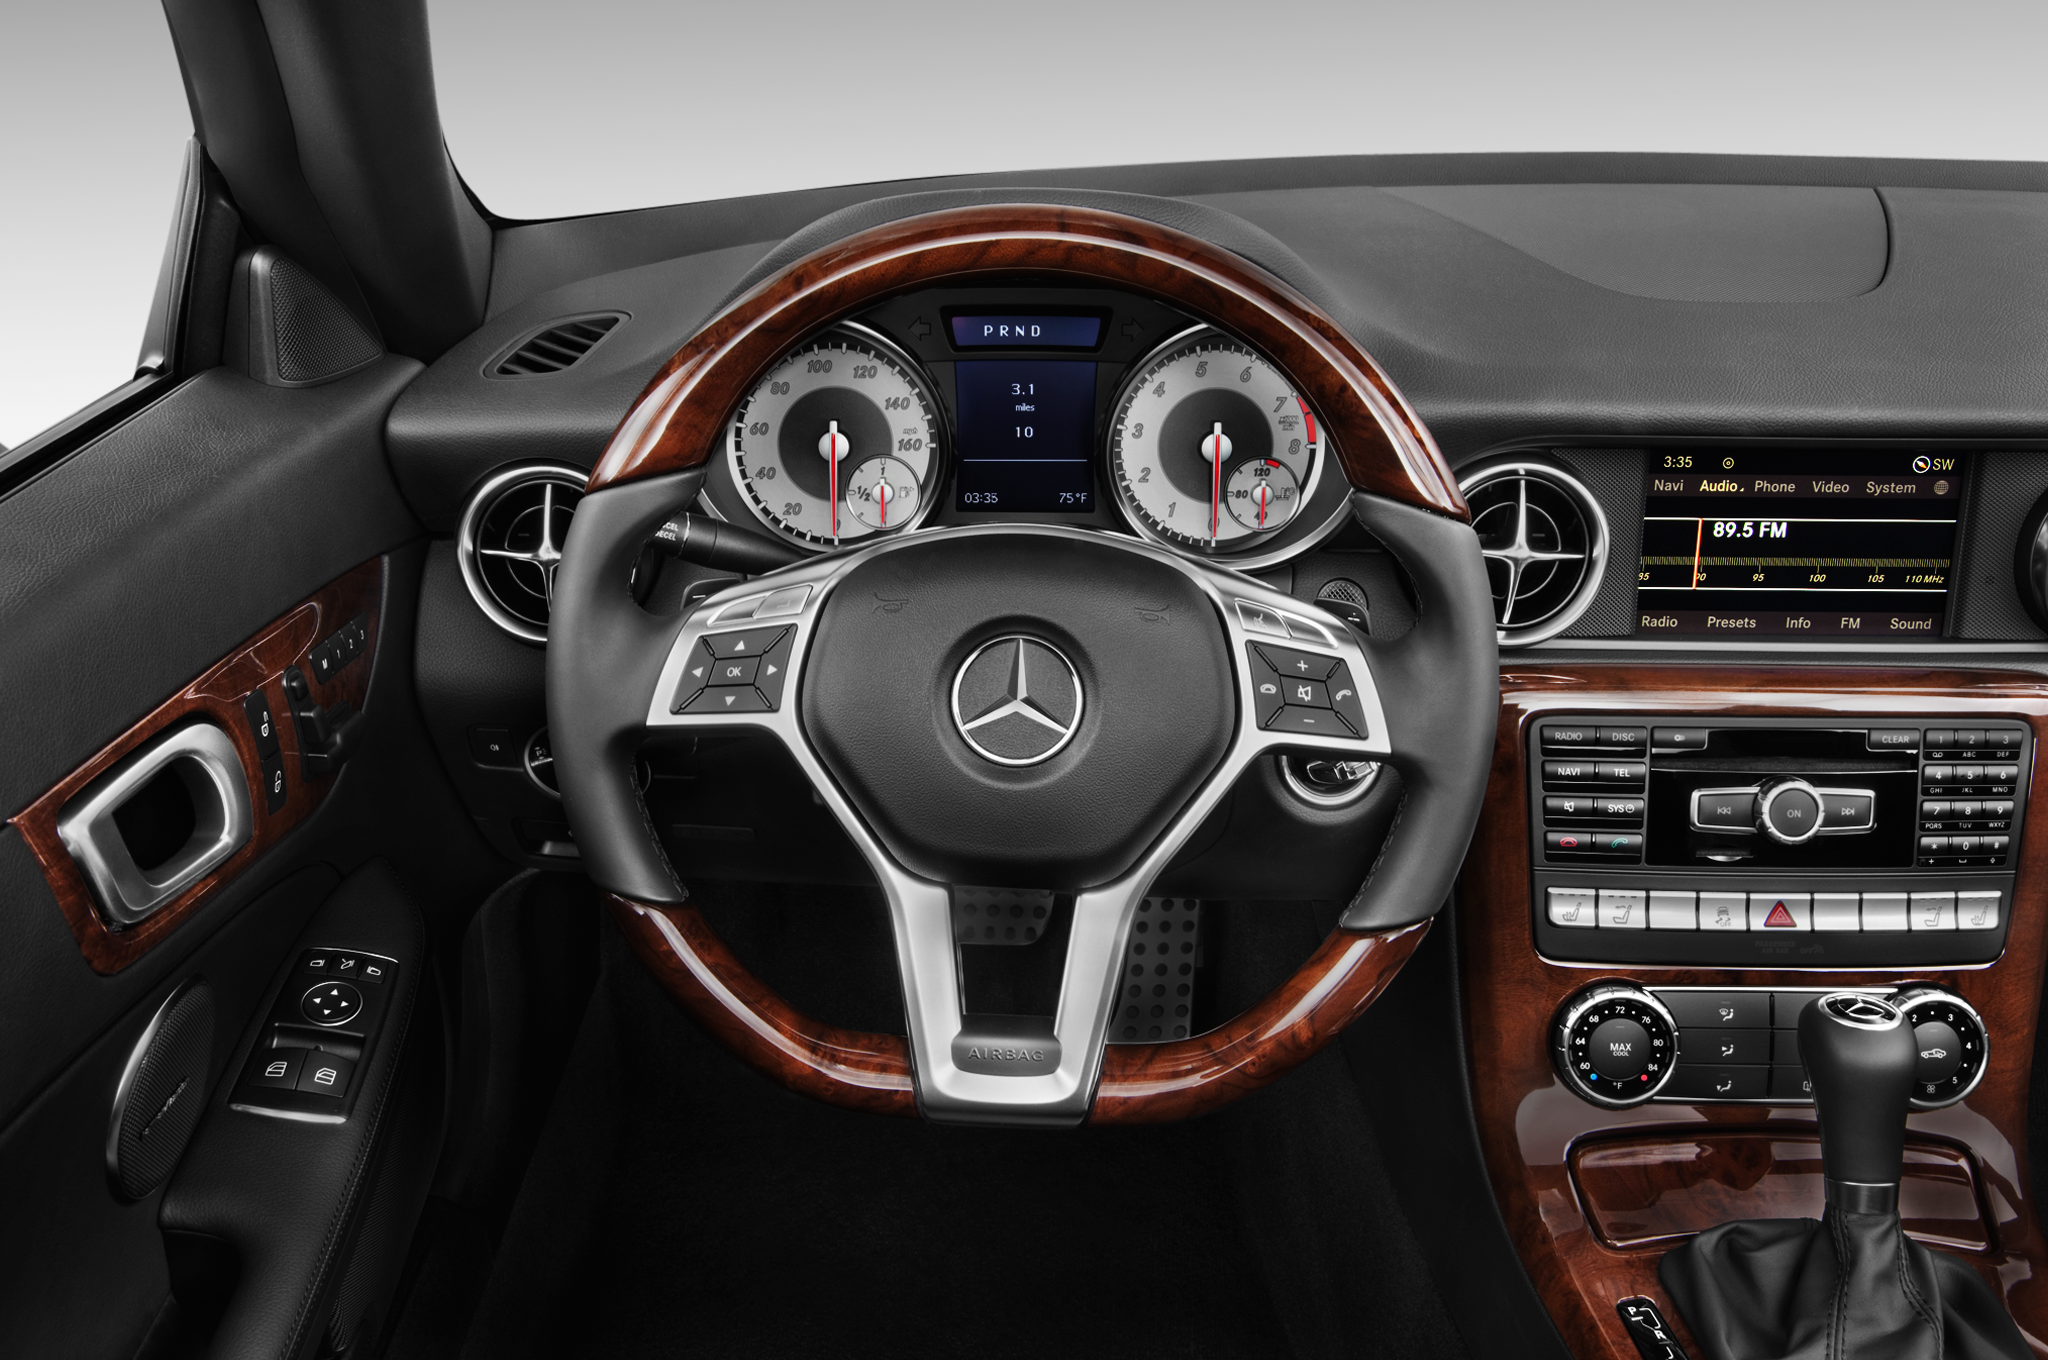 2016 Mercedes Benz Slk Updated With New Engine 1996 Kia Sportage Diagram 17 25